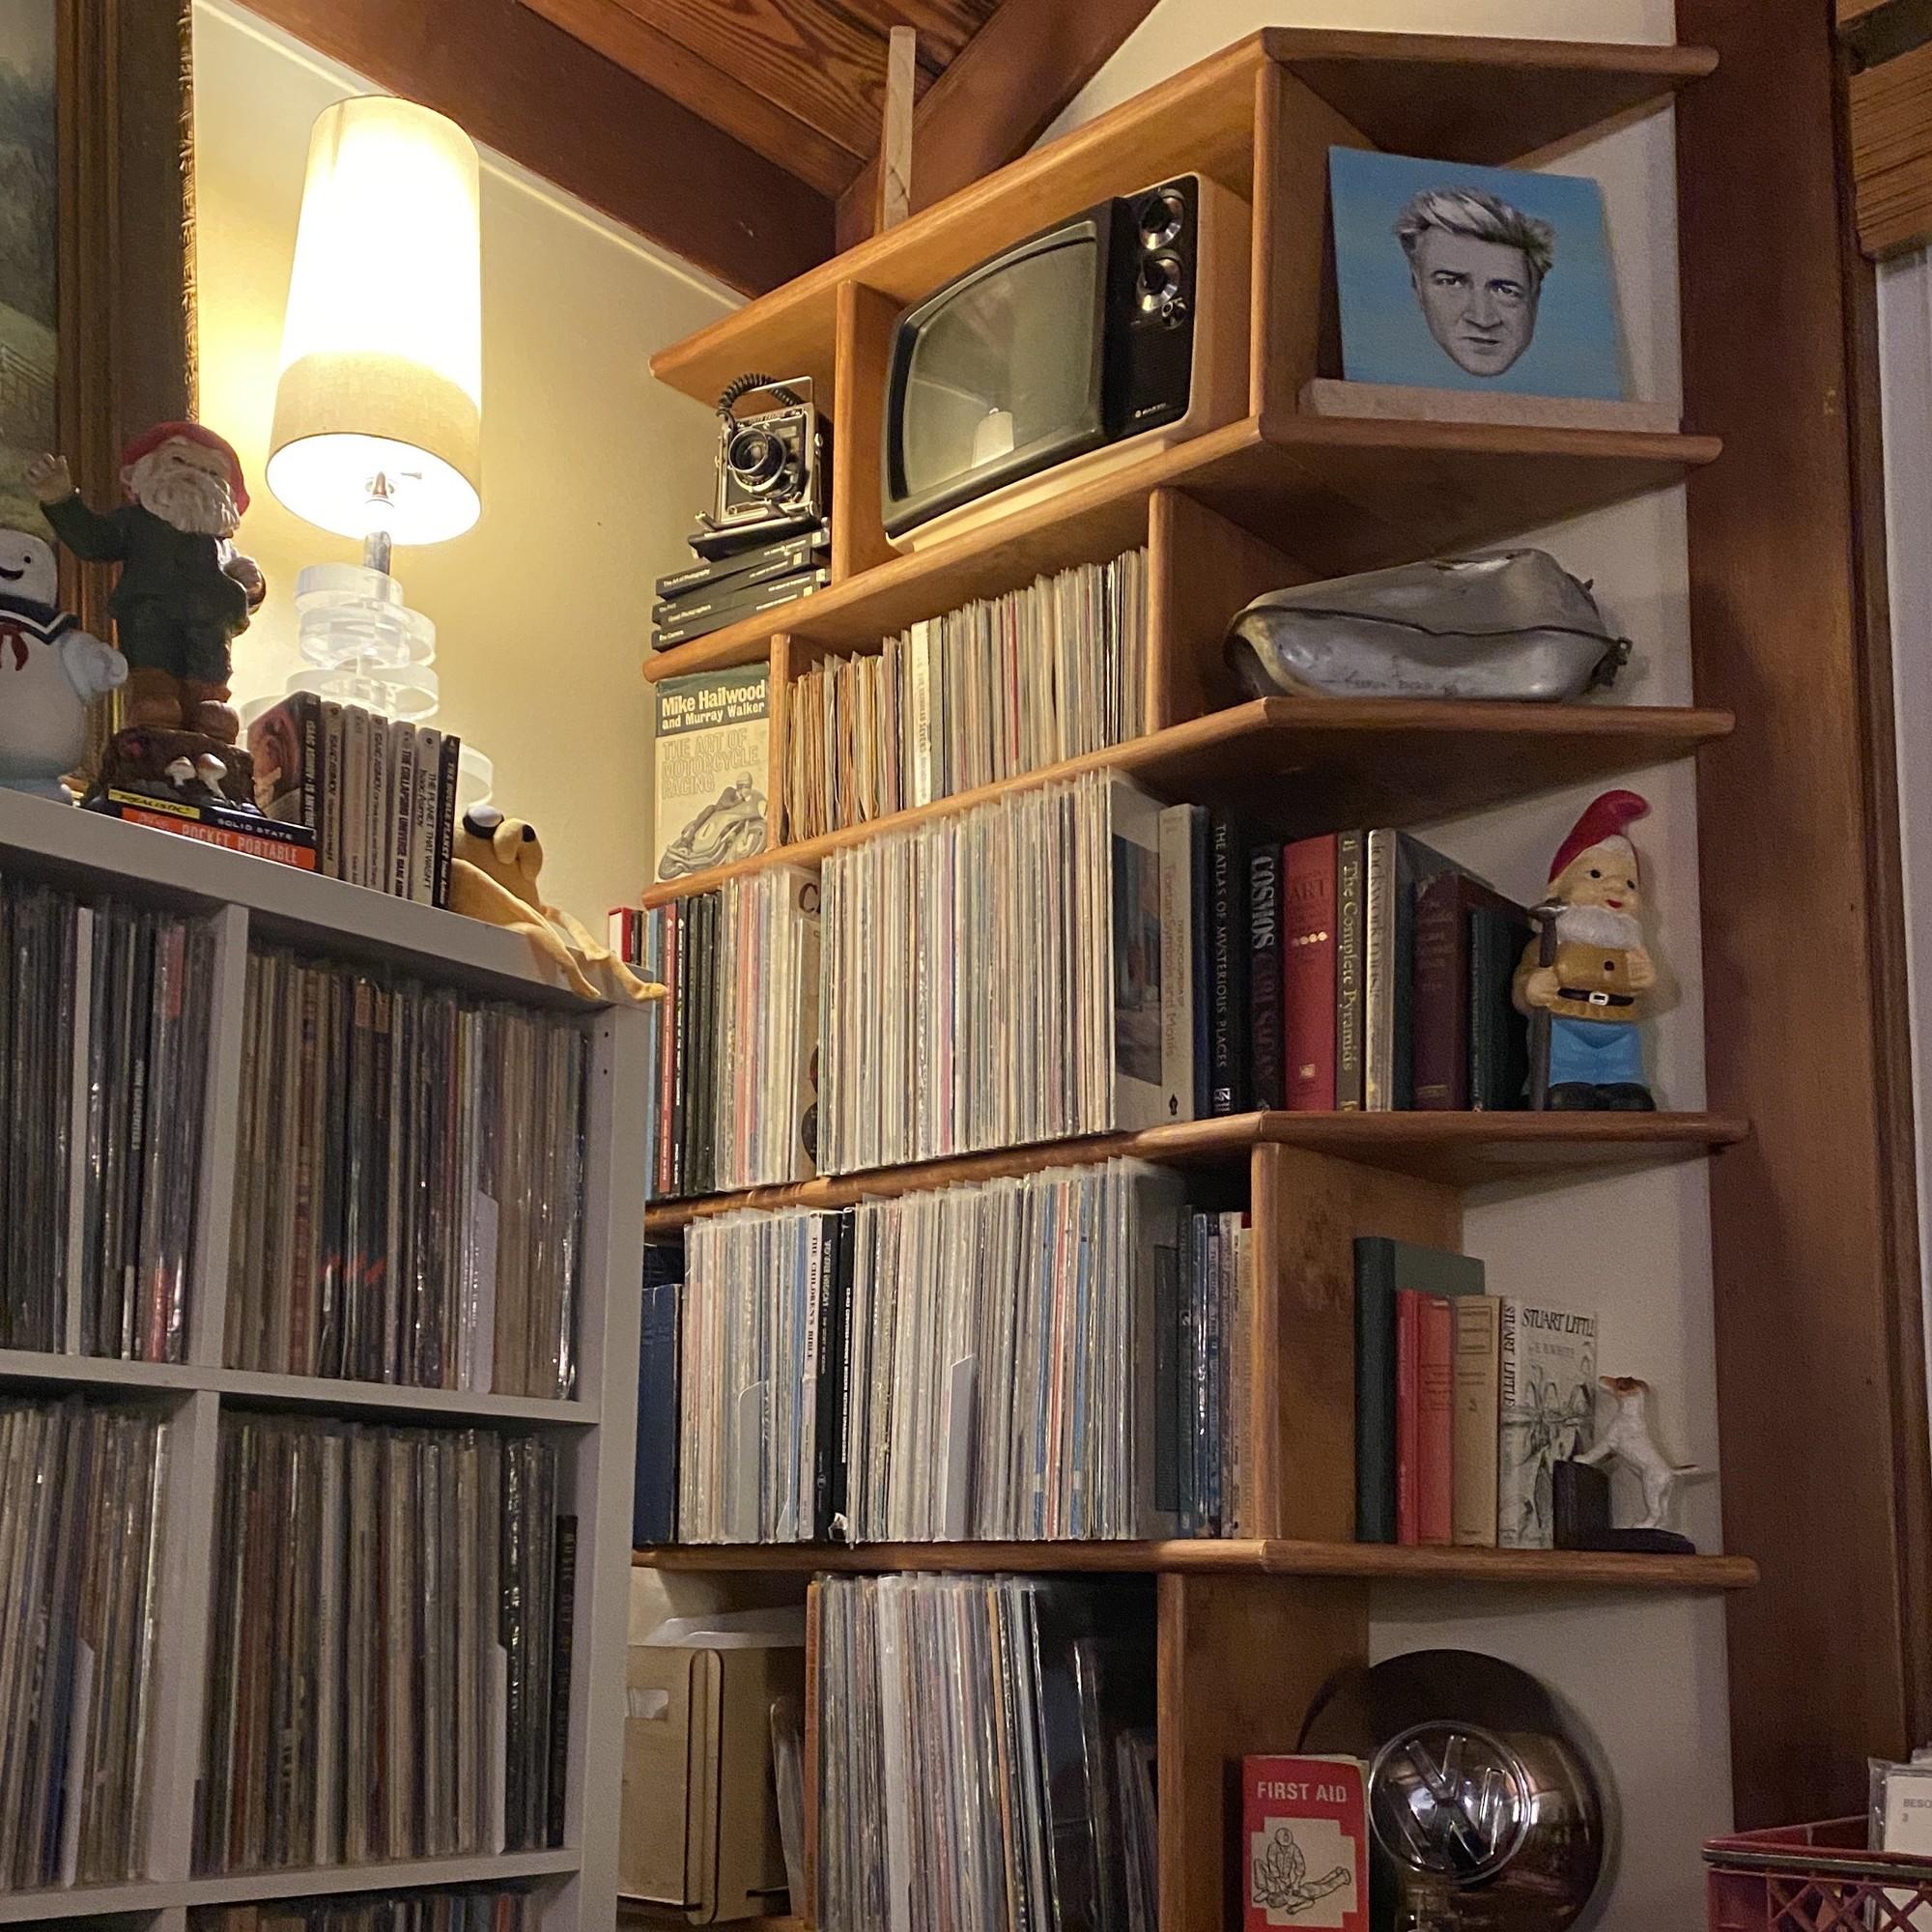 Piper's record shelves